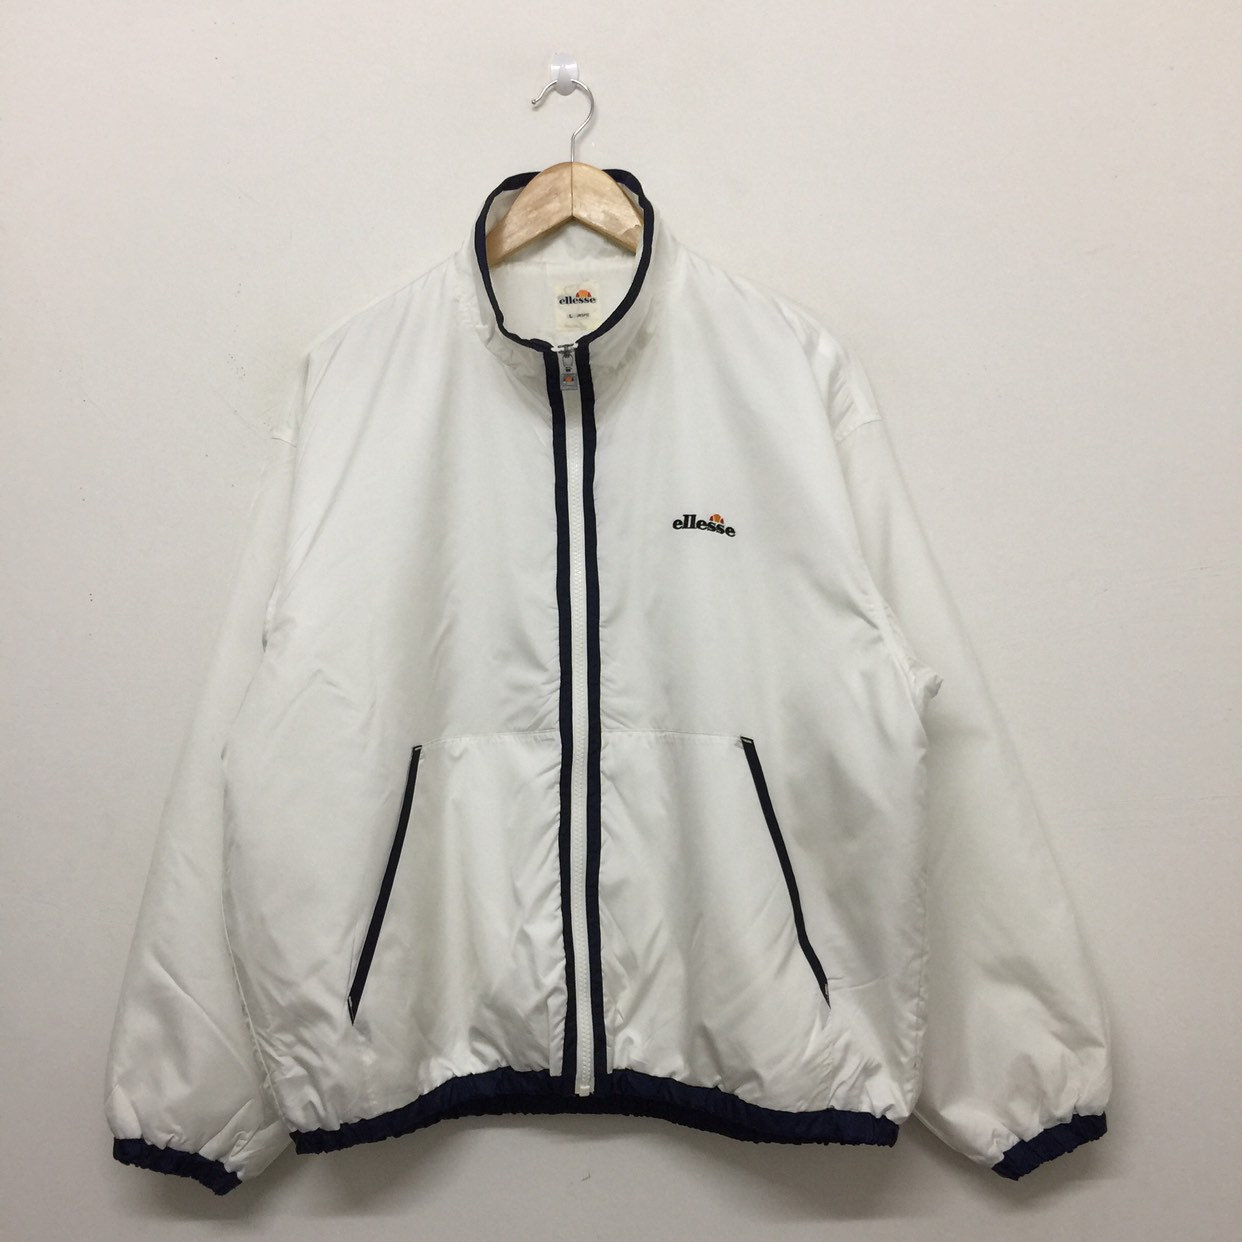 cced23f487 Vintage Ellesse White Windbreaker Mens Size L / 90s Ellesse Full Zip  Lightweight Jacket